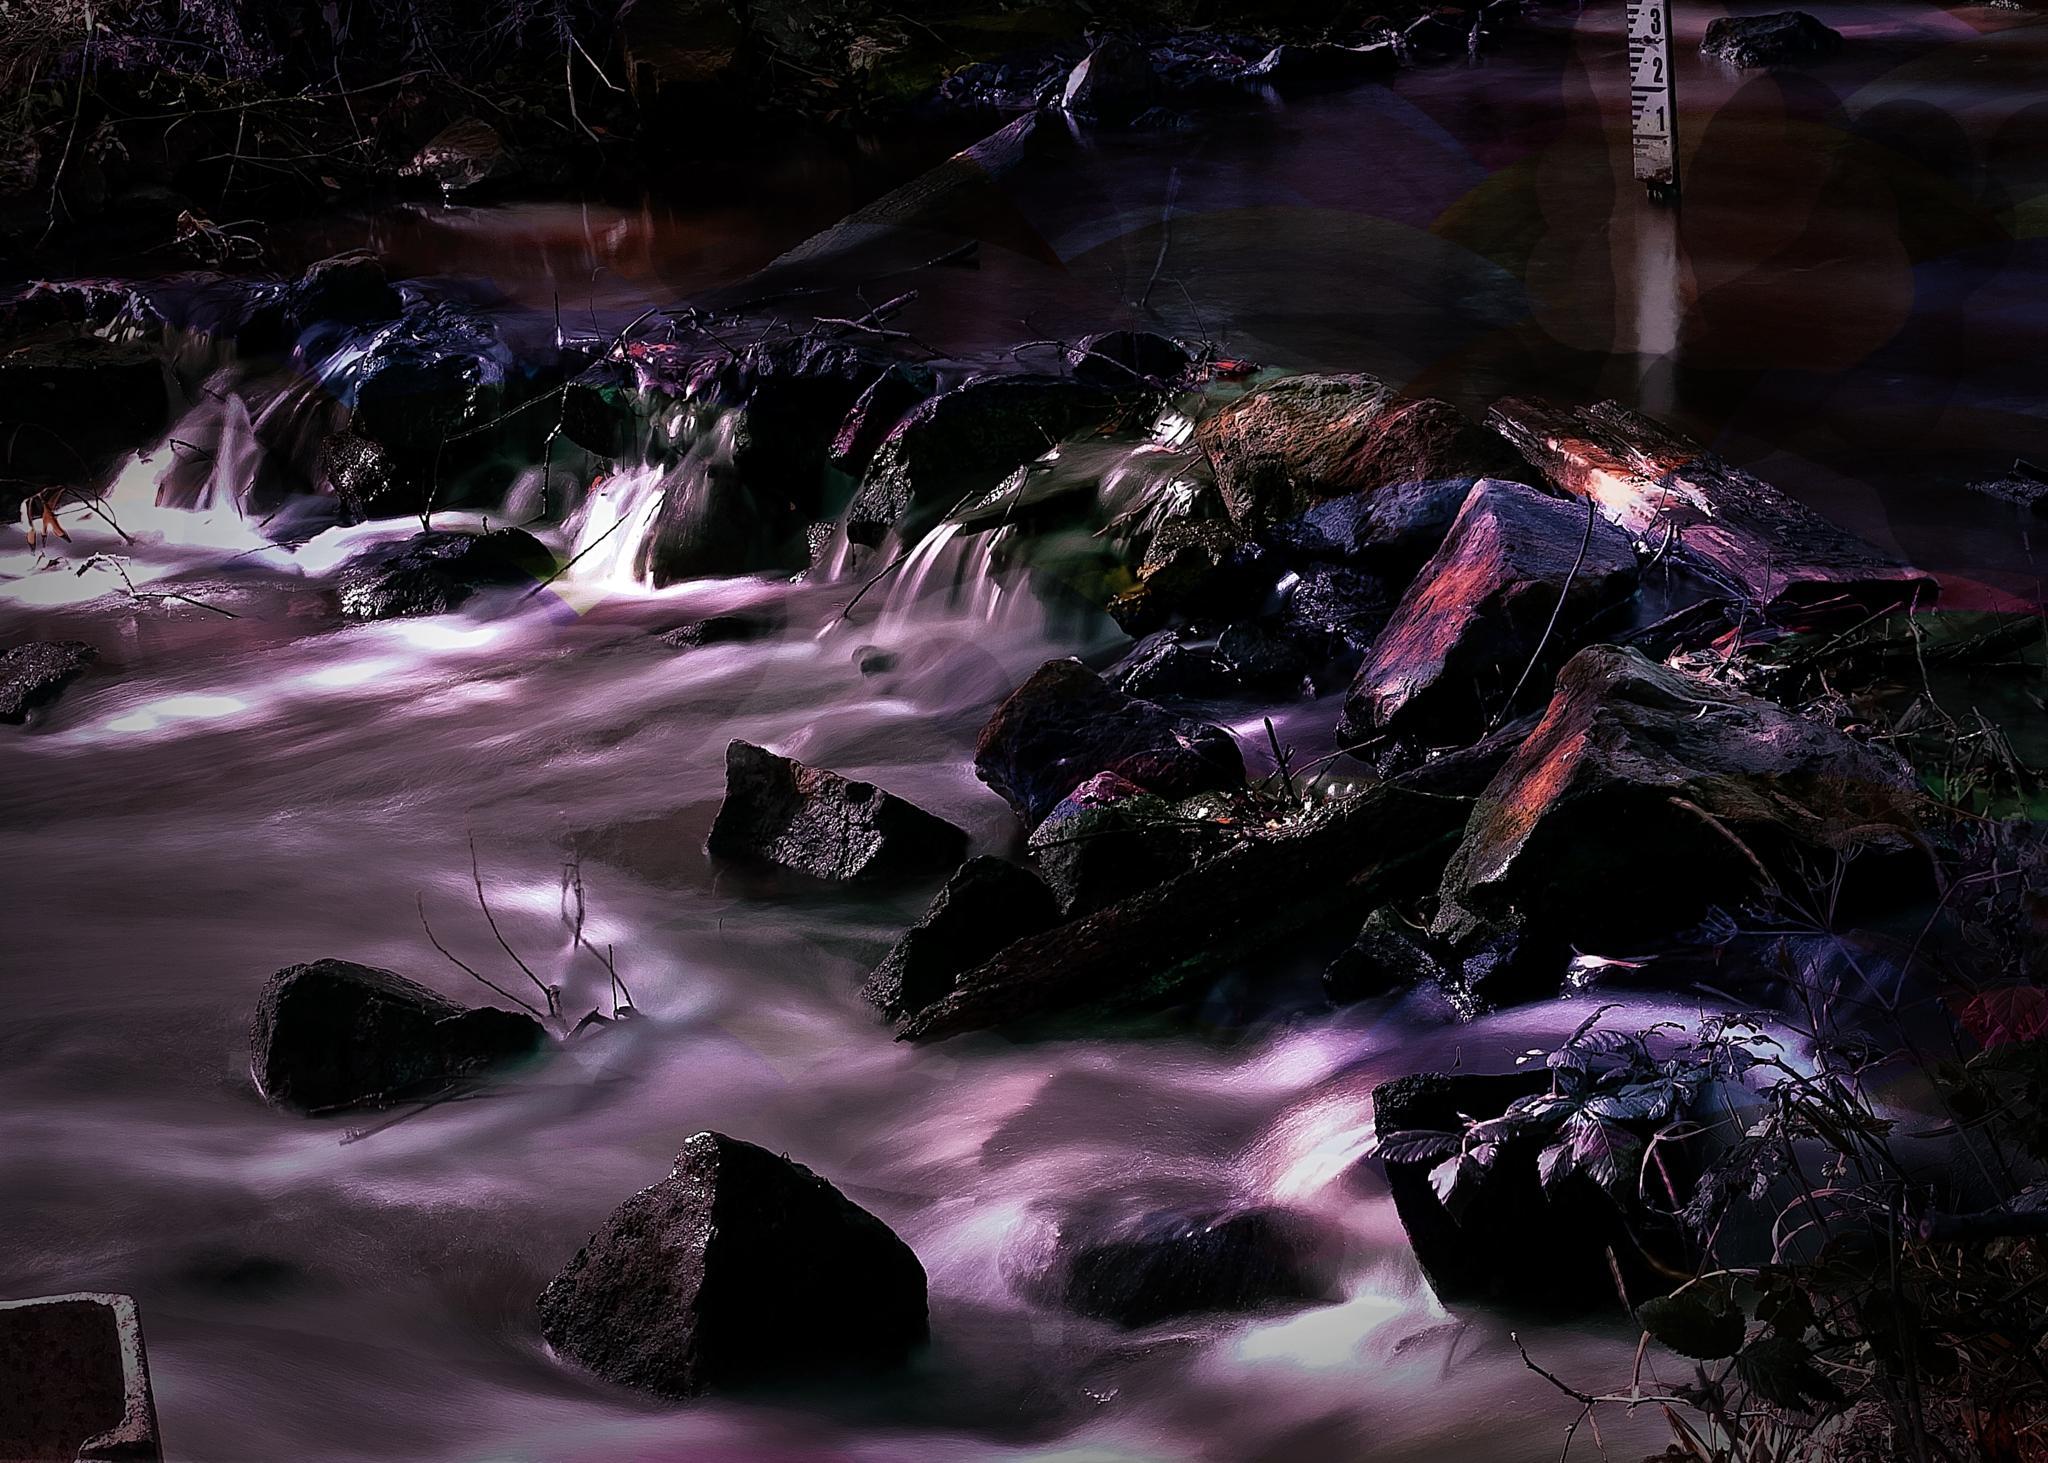 Dappled Sunlight Waterfall by David Owen